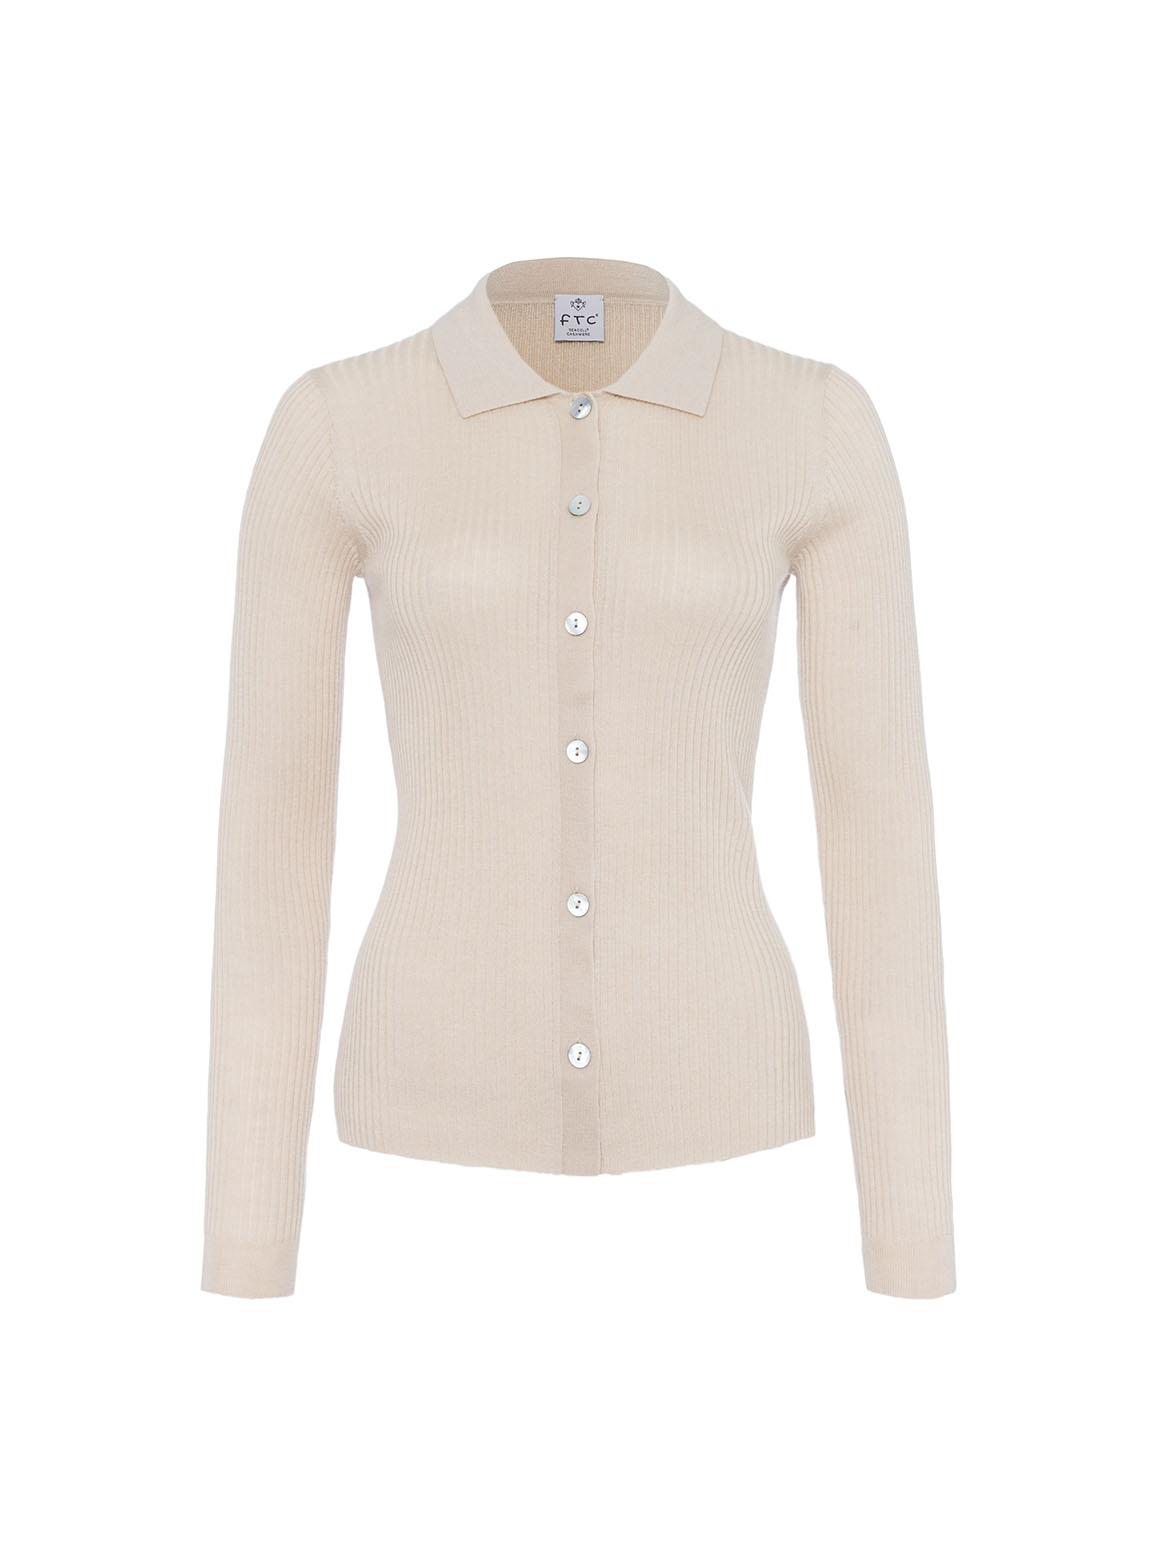 Shirt with Polo-Collar